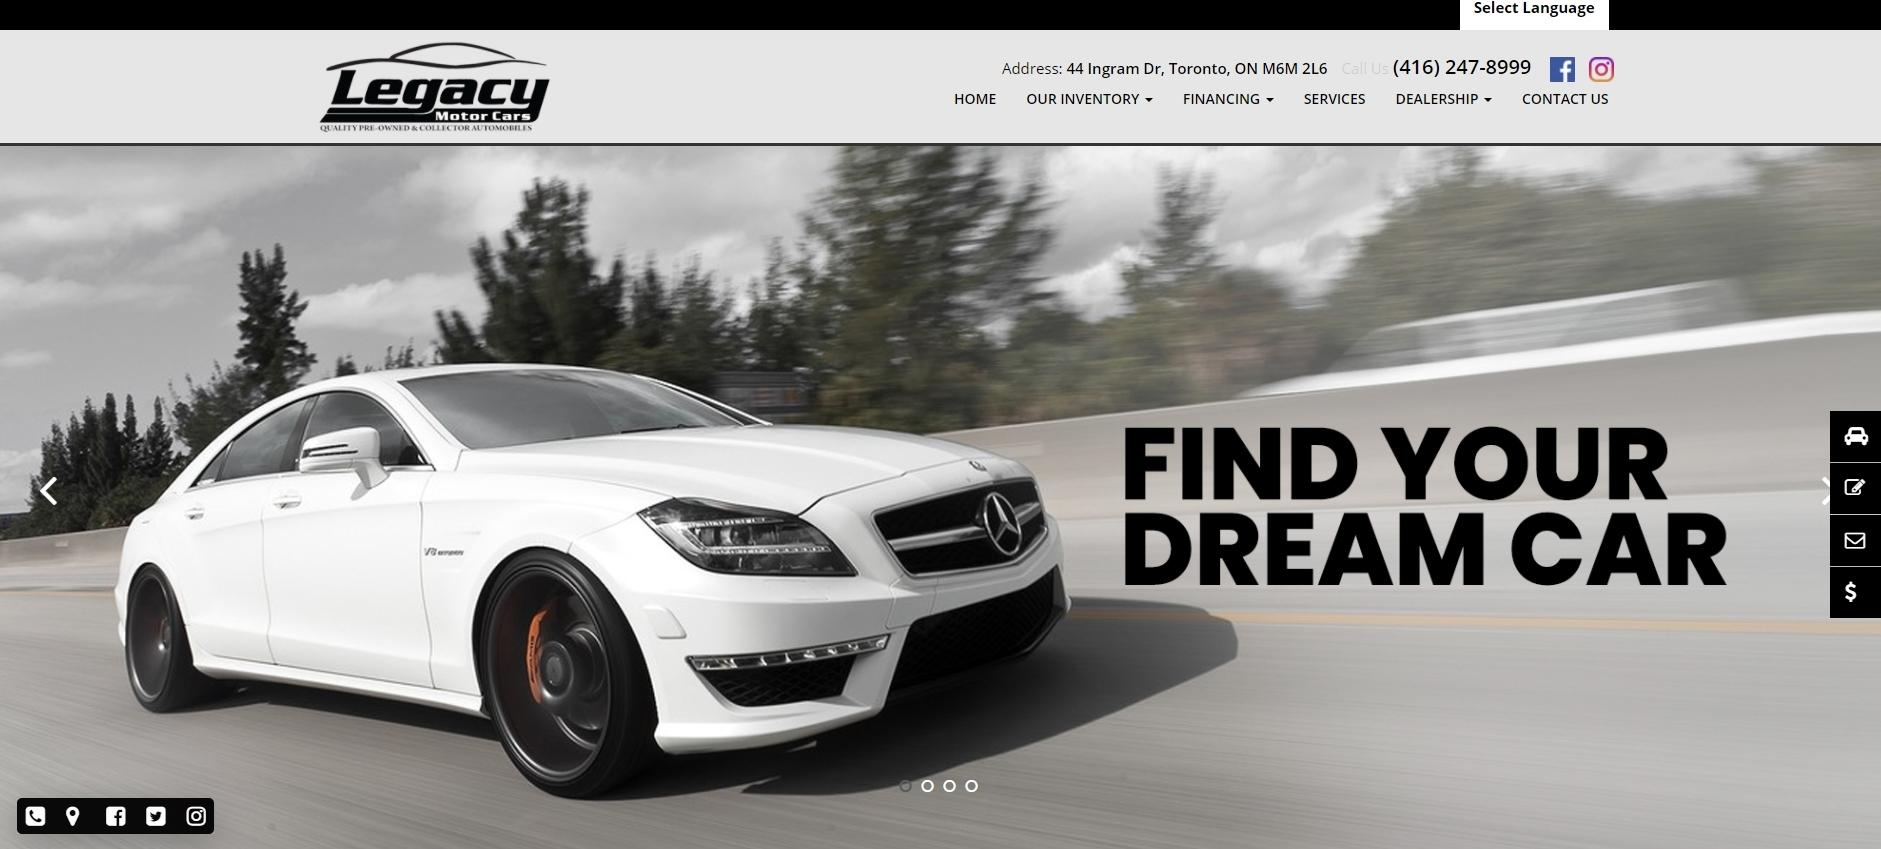 Legacy Motors Cars -used car dealerships